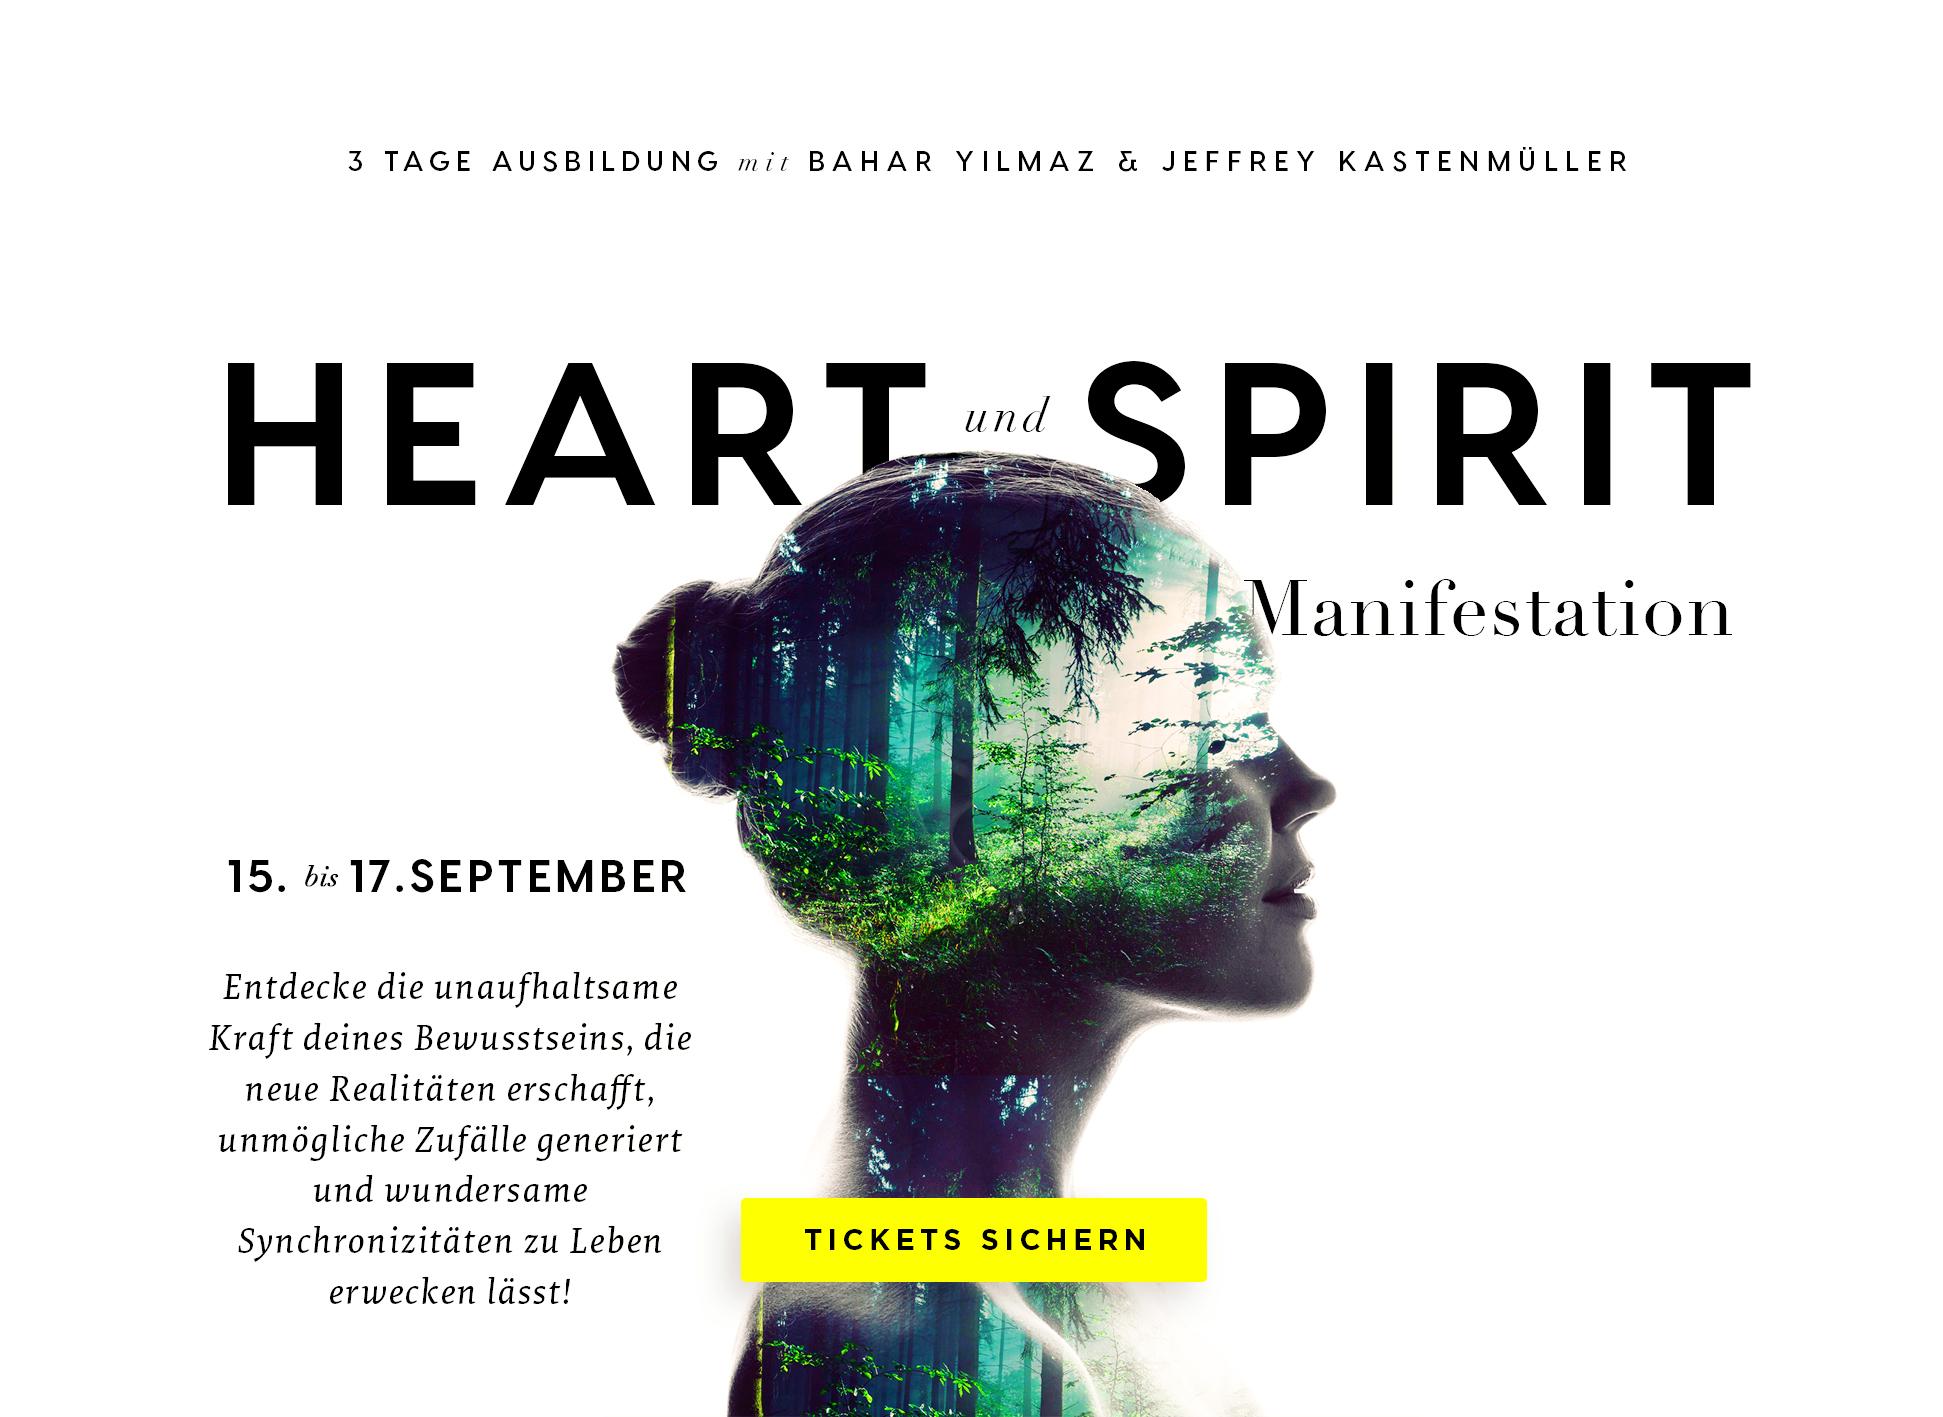 Kurzausbildung: Heart & Spirit Manifestation mit Bahar & Jeffrey (Karlsruhe)